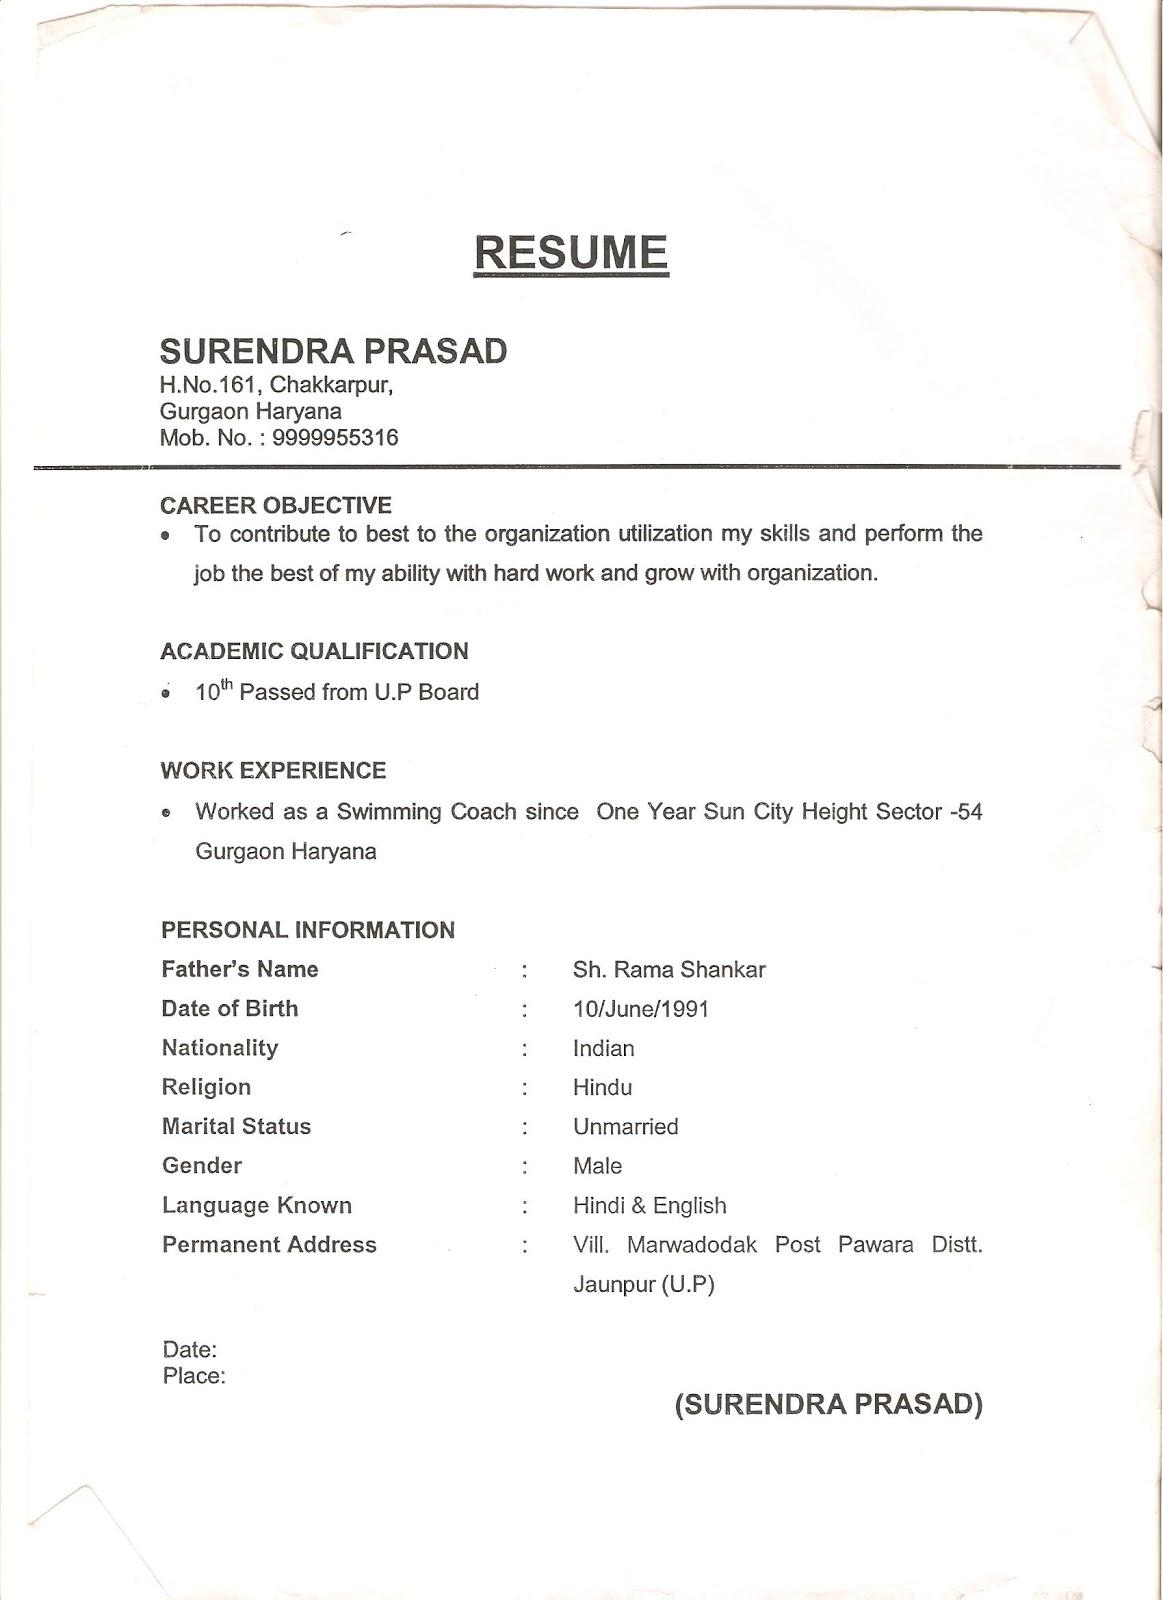 How To Write Nanny Resume | Sample Job Application Letter